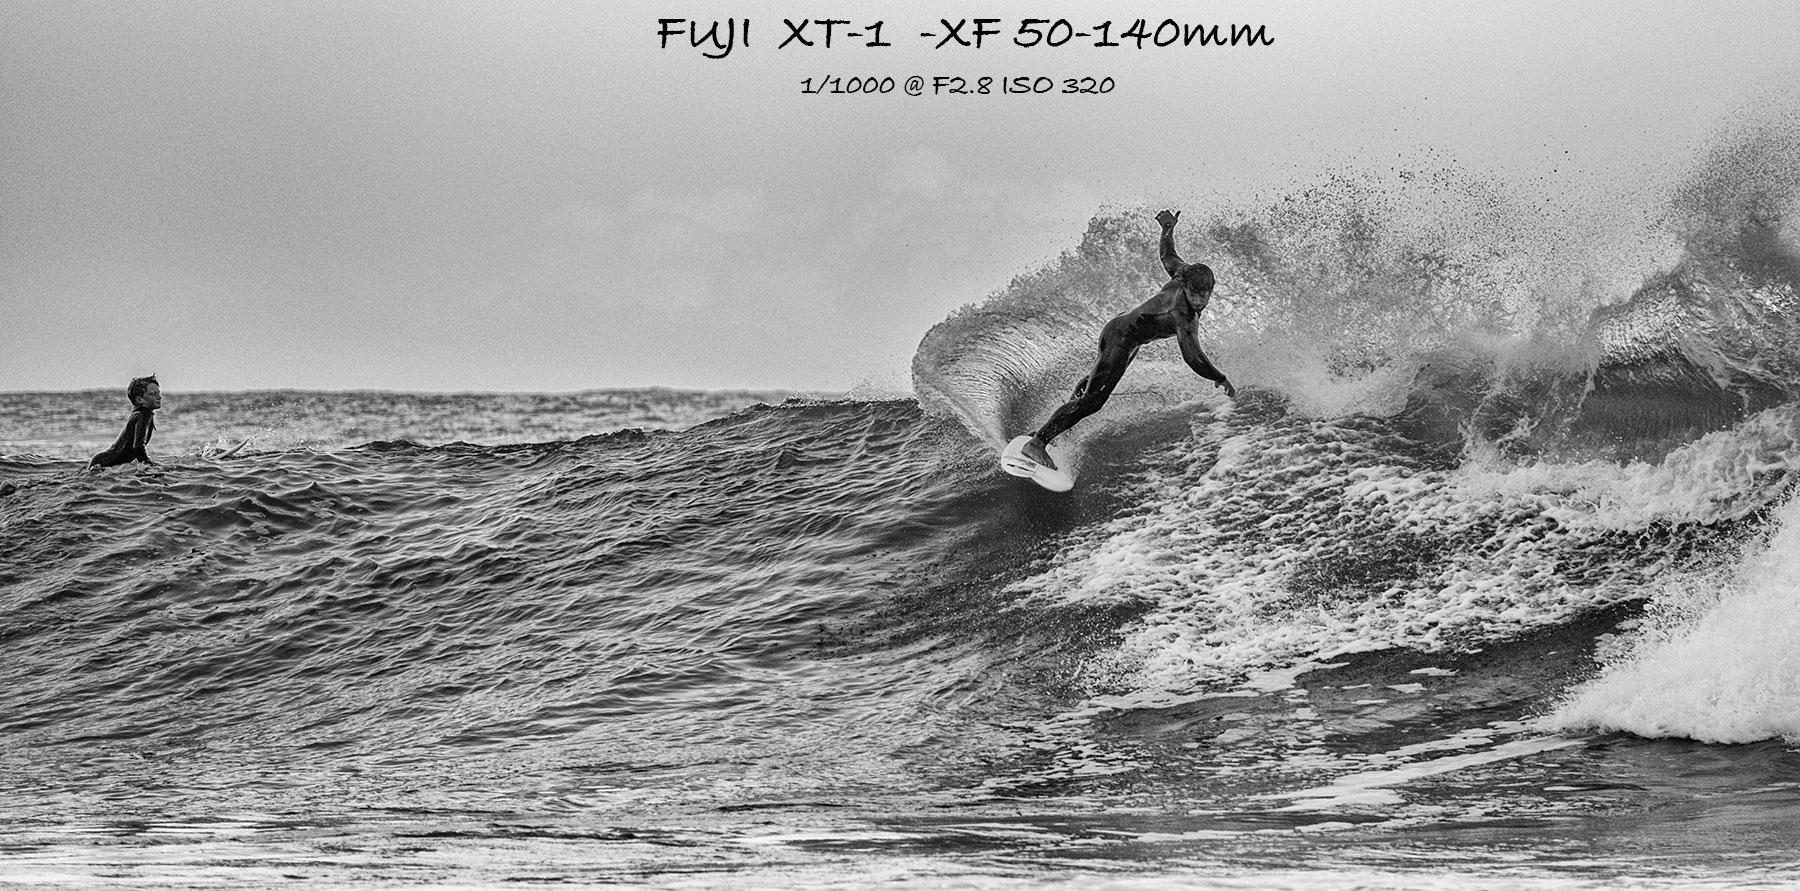 surfer-vicbay.jpg